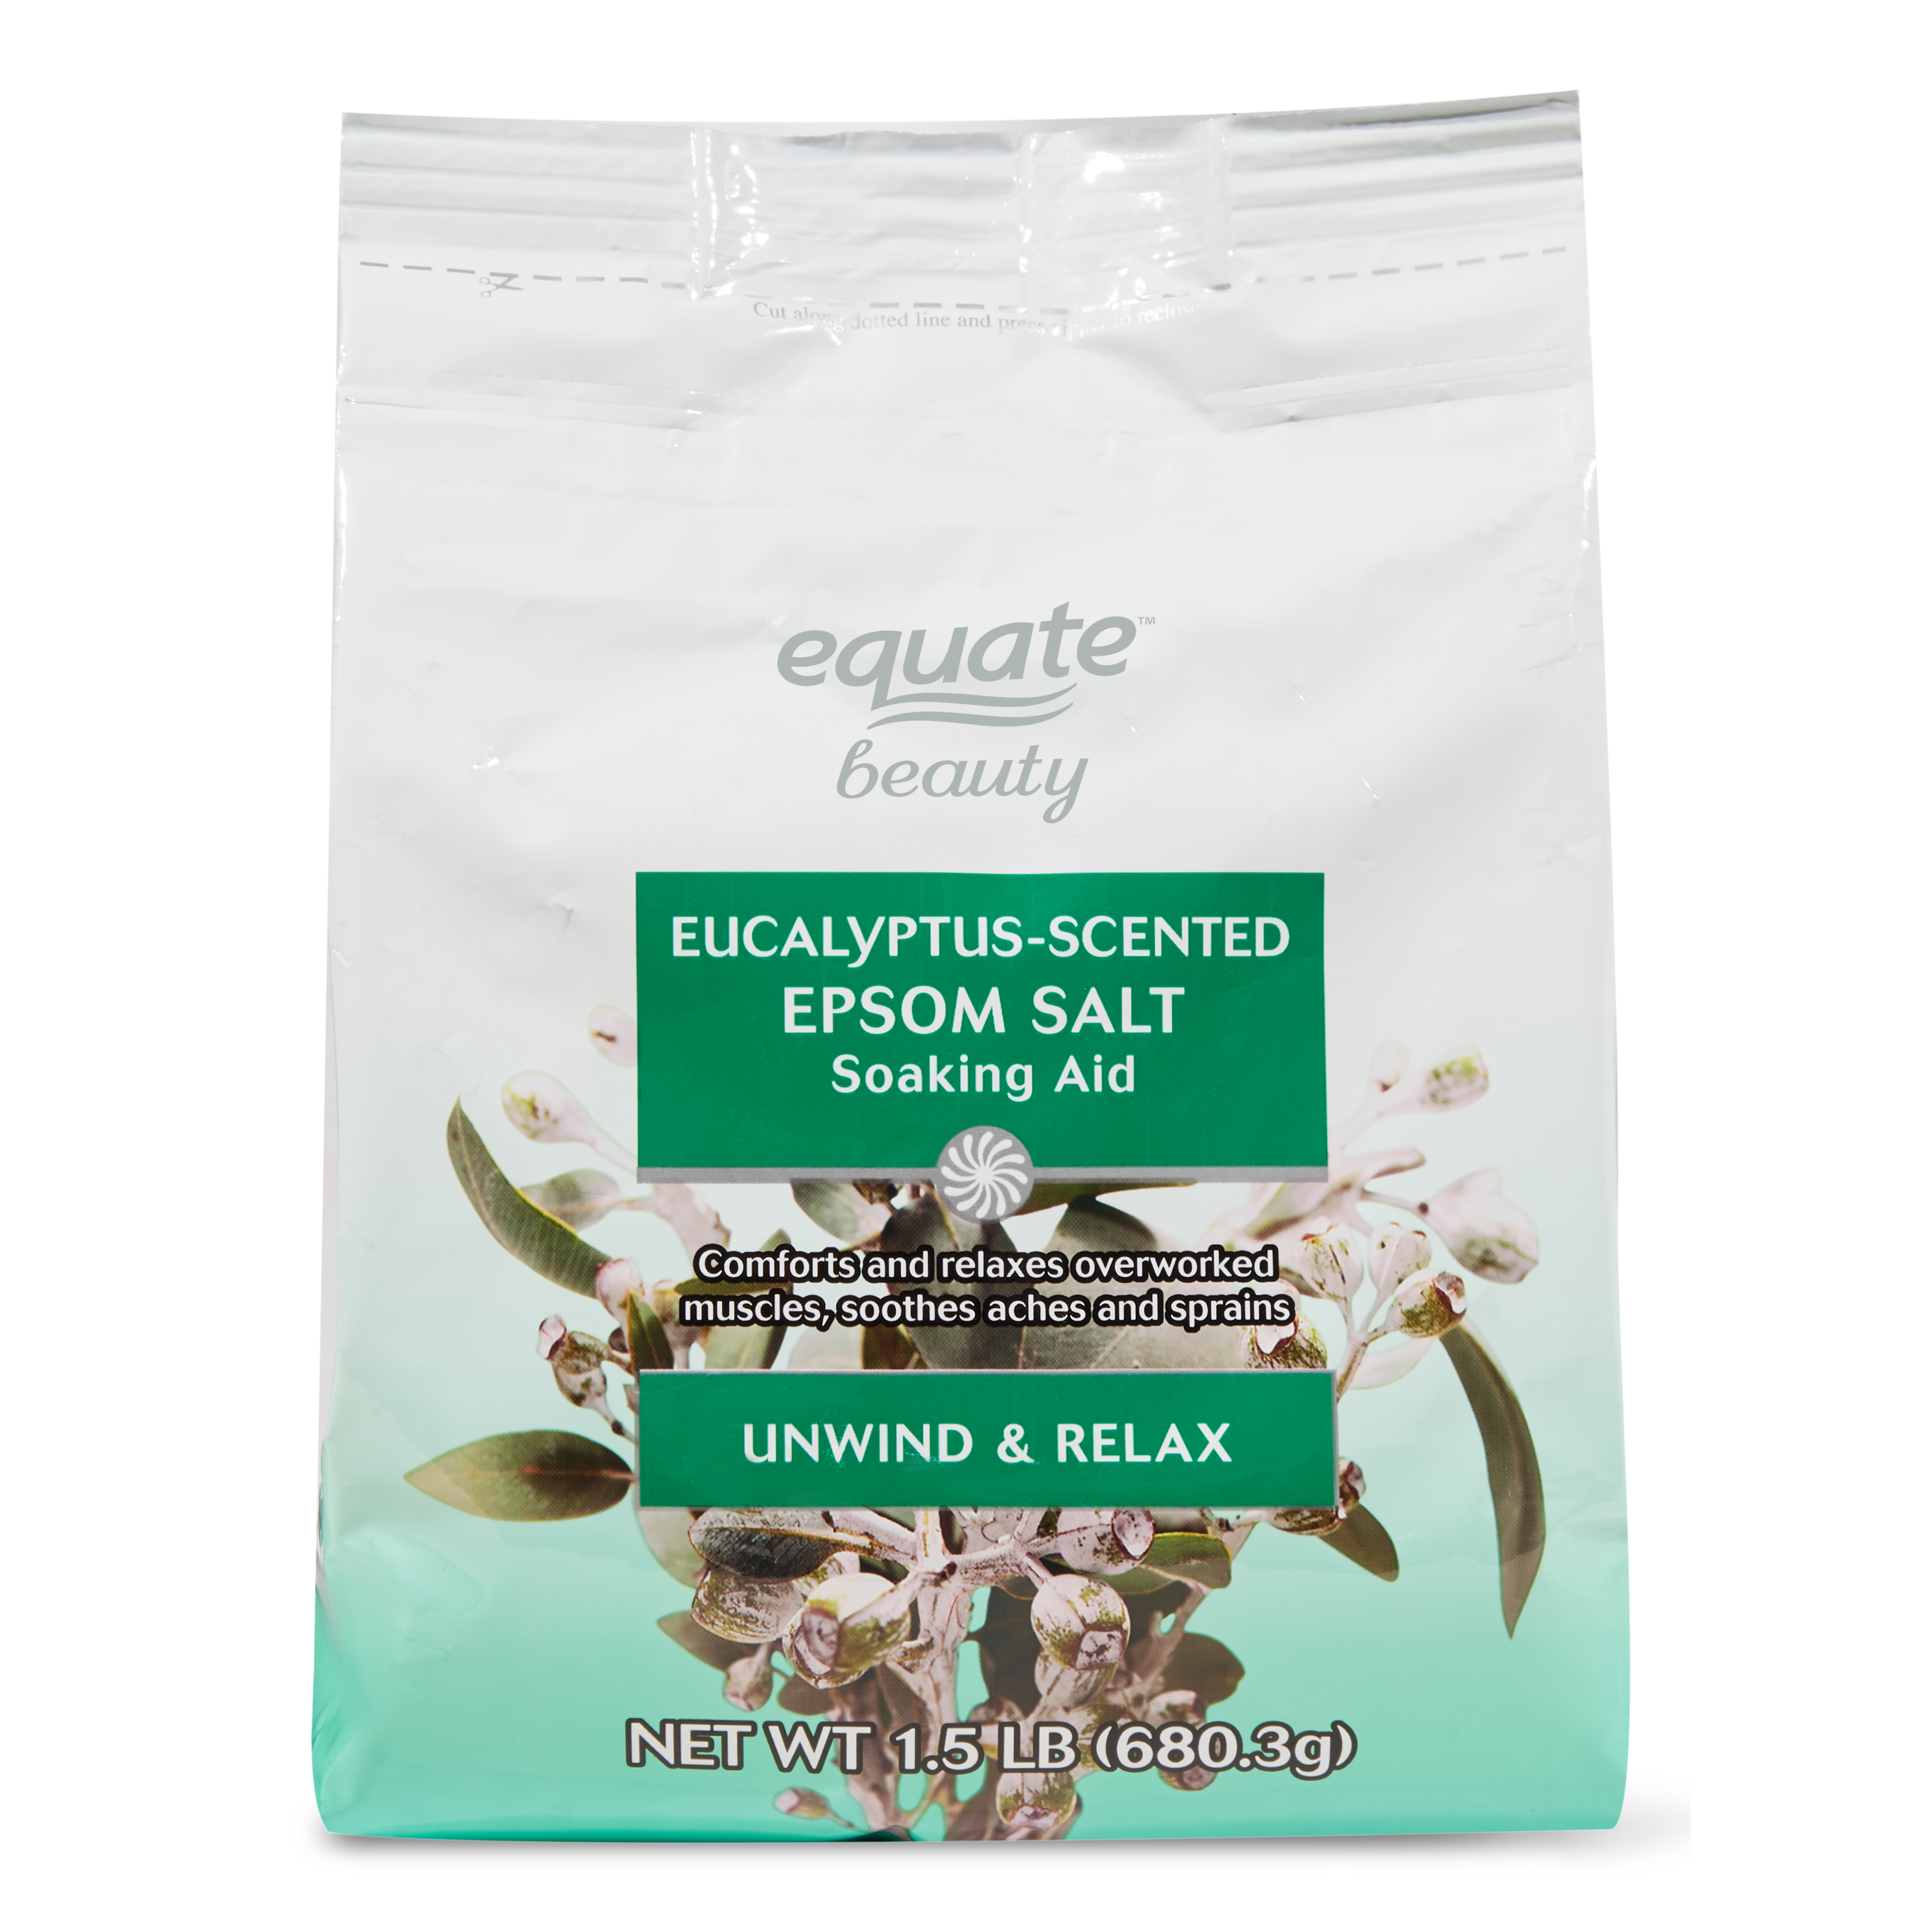 Equate Beauty Eucalyptus-Scented Epsom Salt Soaking Aid, 1.5 lb ...